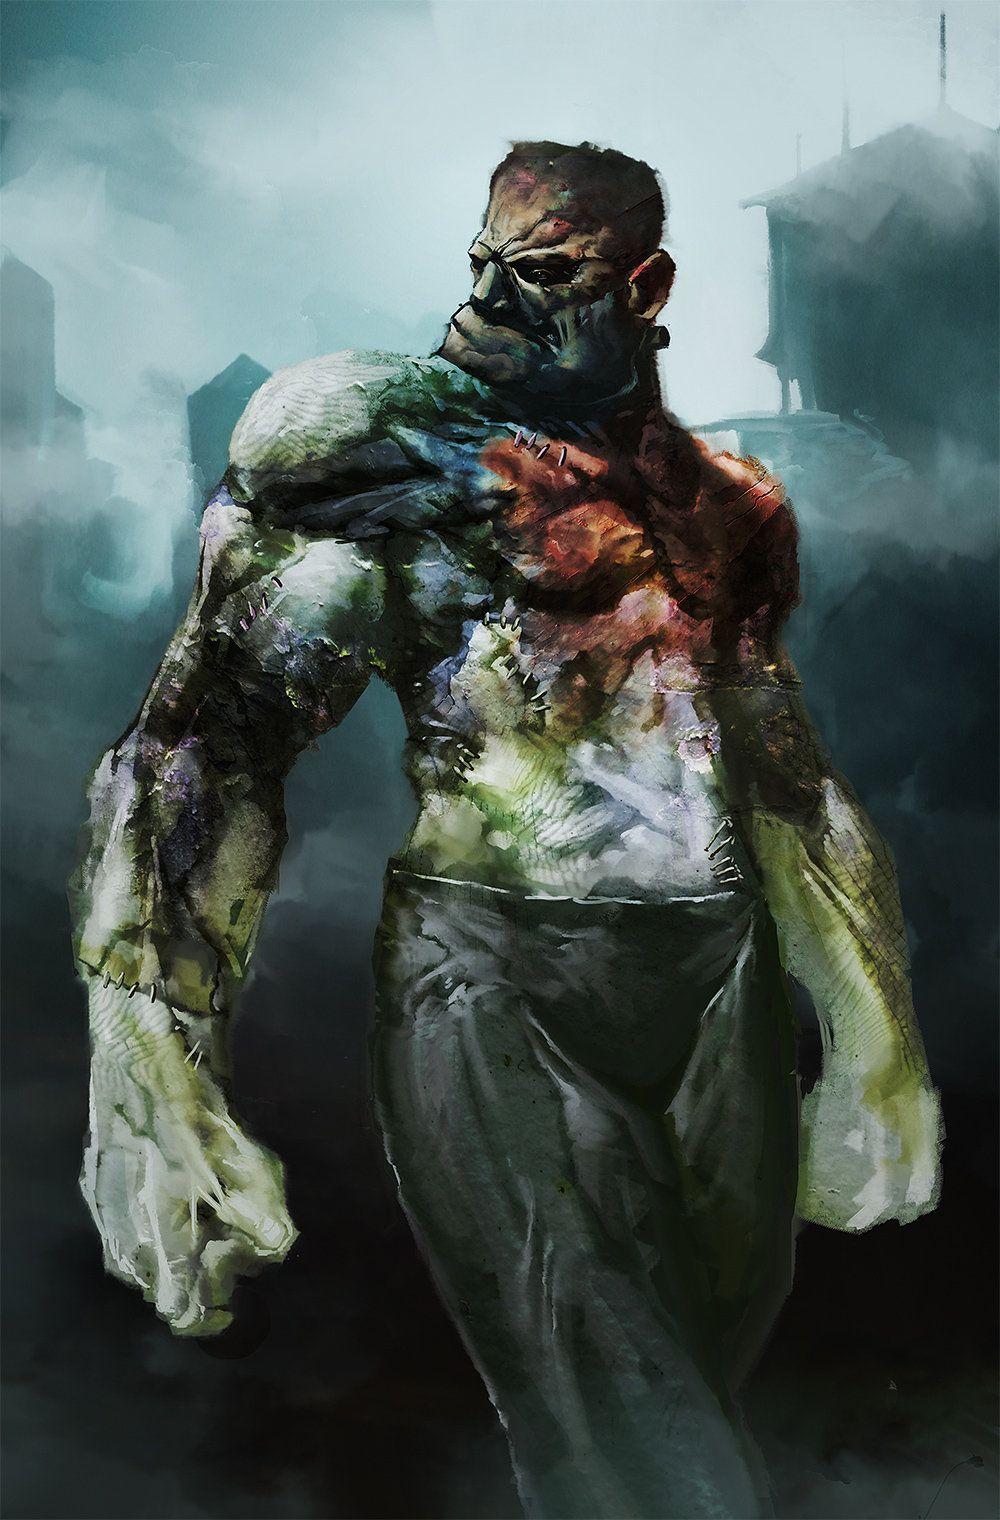 Frankensteins monster aaron nakahara on artstation at